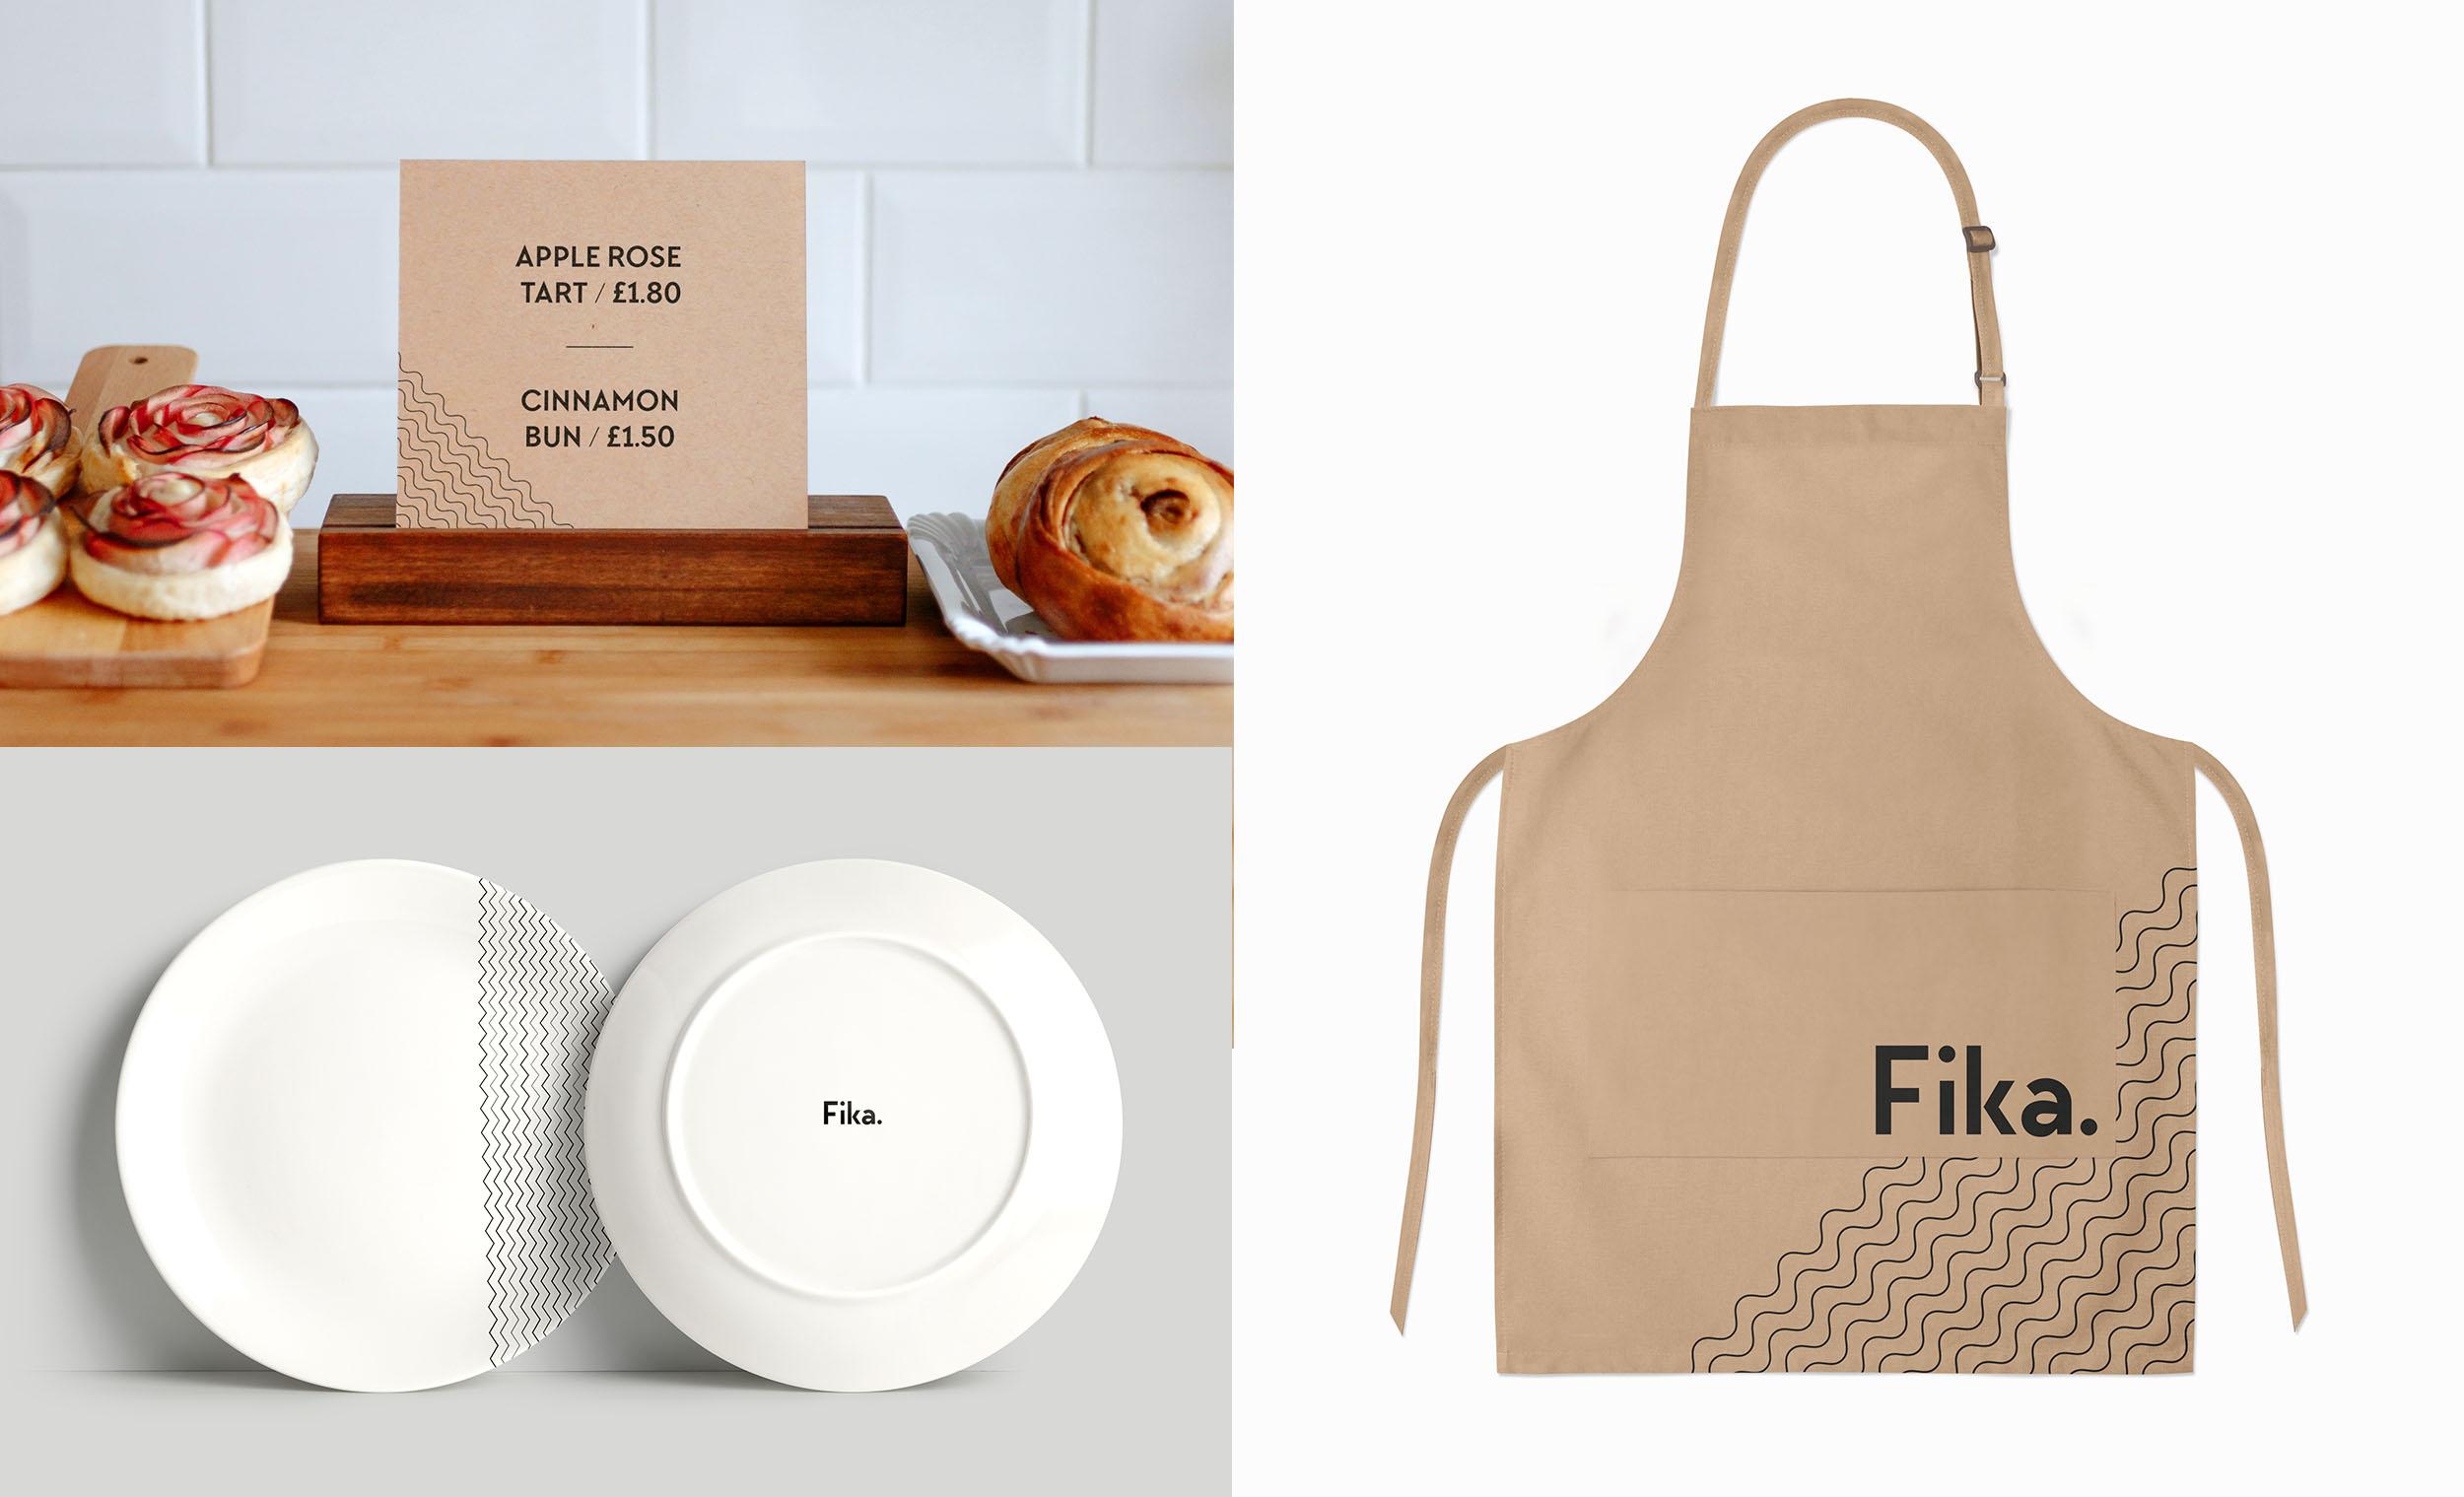 Fika cafe branding and design.jpg